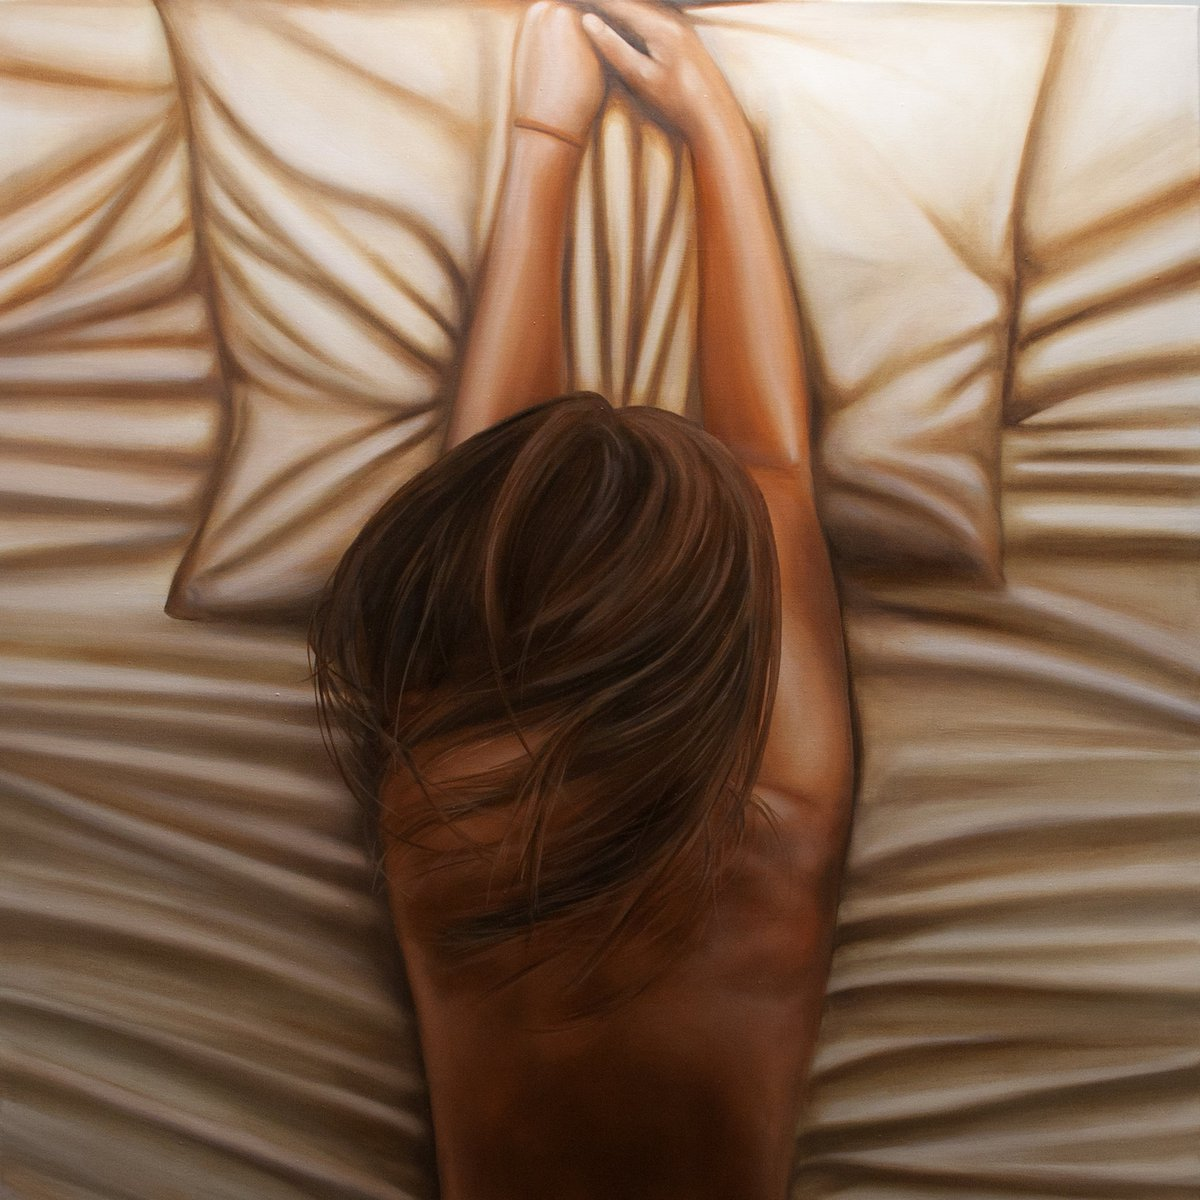 Painting available on ebay.us/o0yBd8 via @eBay_UK @eBay #artlover #oilpainting #artforsale #ContemporaryArt #portrait #artoninstagram #artontwitter #art #Artist #ArtistOnTwitter #artoftheday #buyart #realist #oiloncanvas #pretty #nude